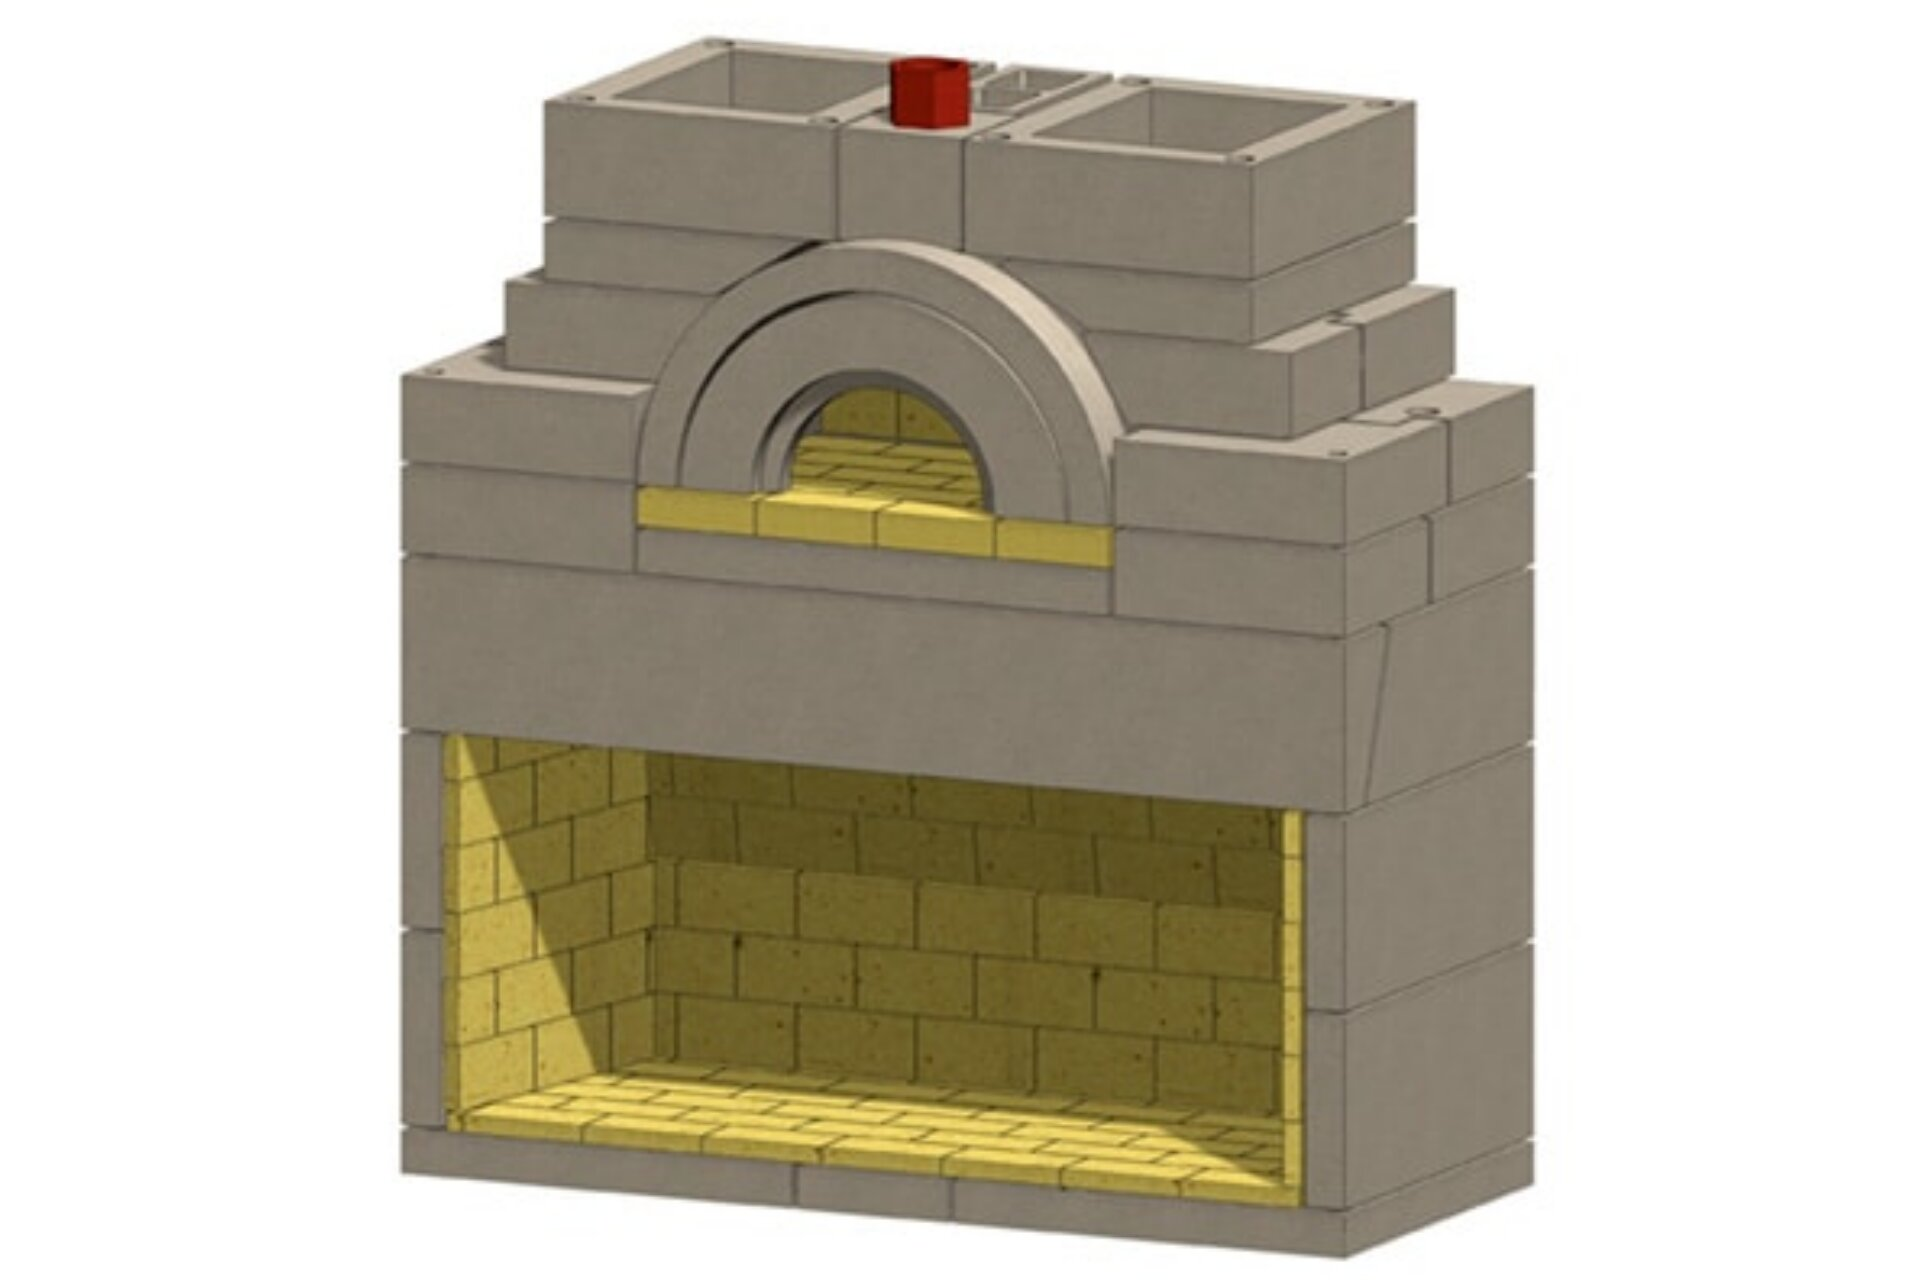 Caminetto Medeo Masonry Pizza Oven Fireplace Kit